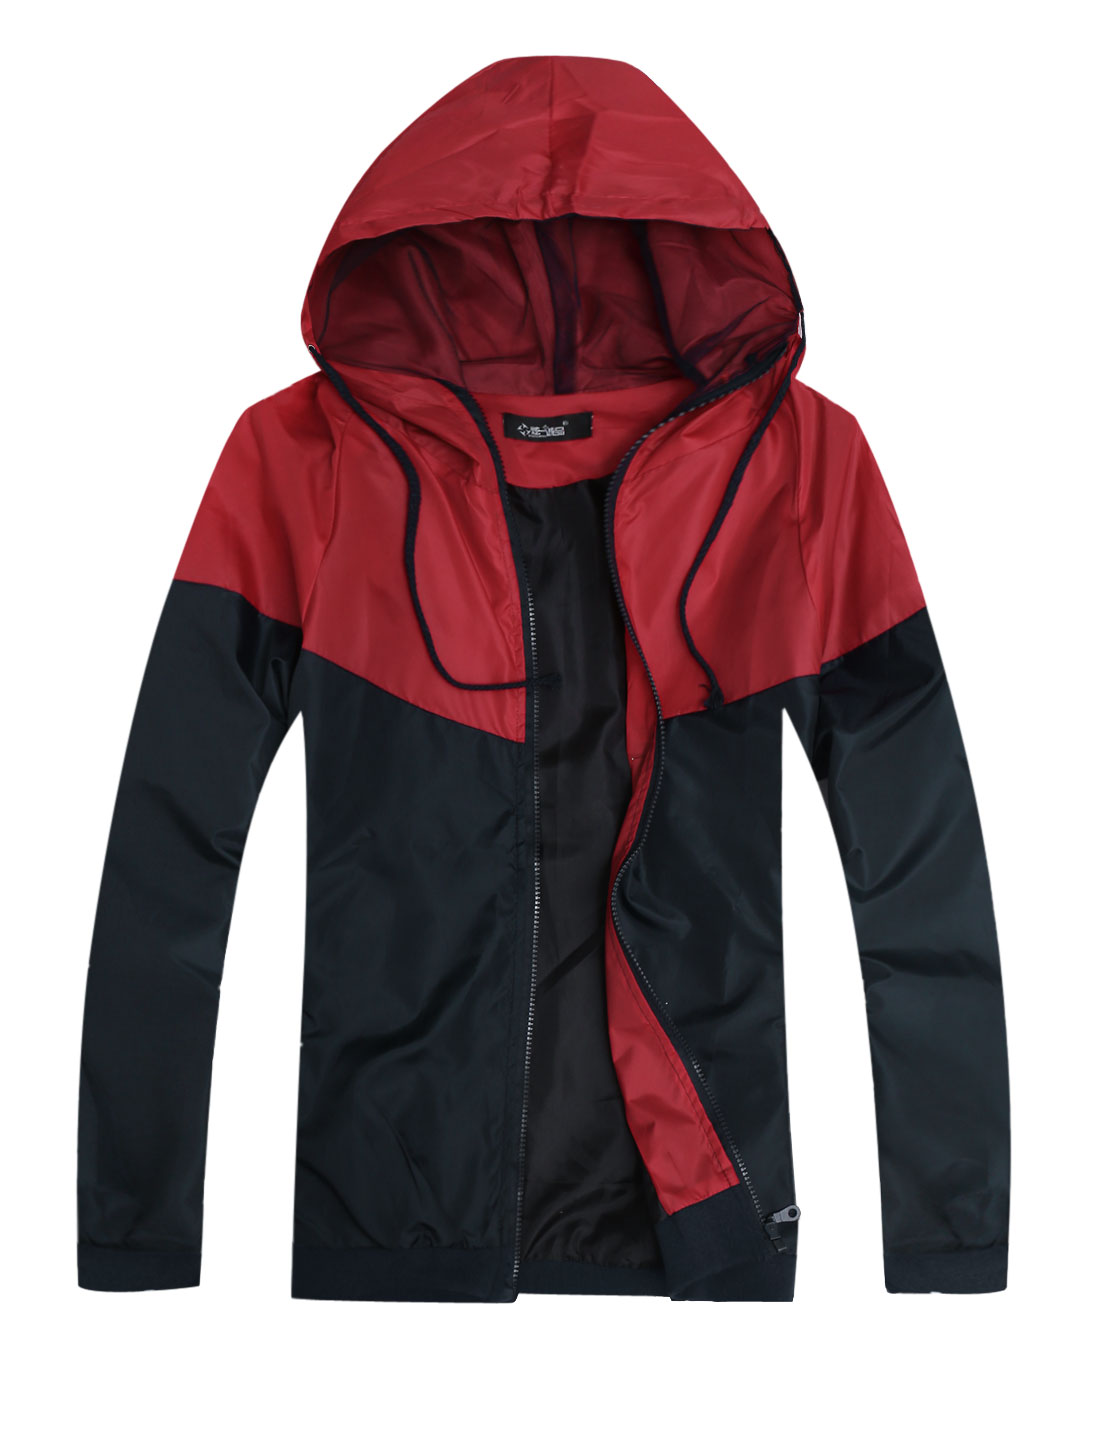 Men Drawstring Hooded Panel Design Colorblock Basic Jacket Red Navy Blue S